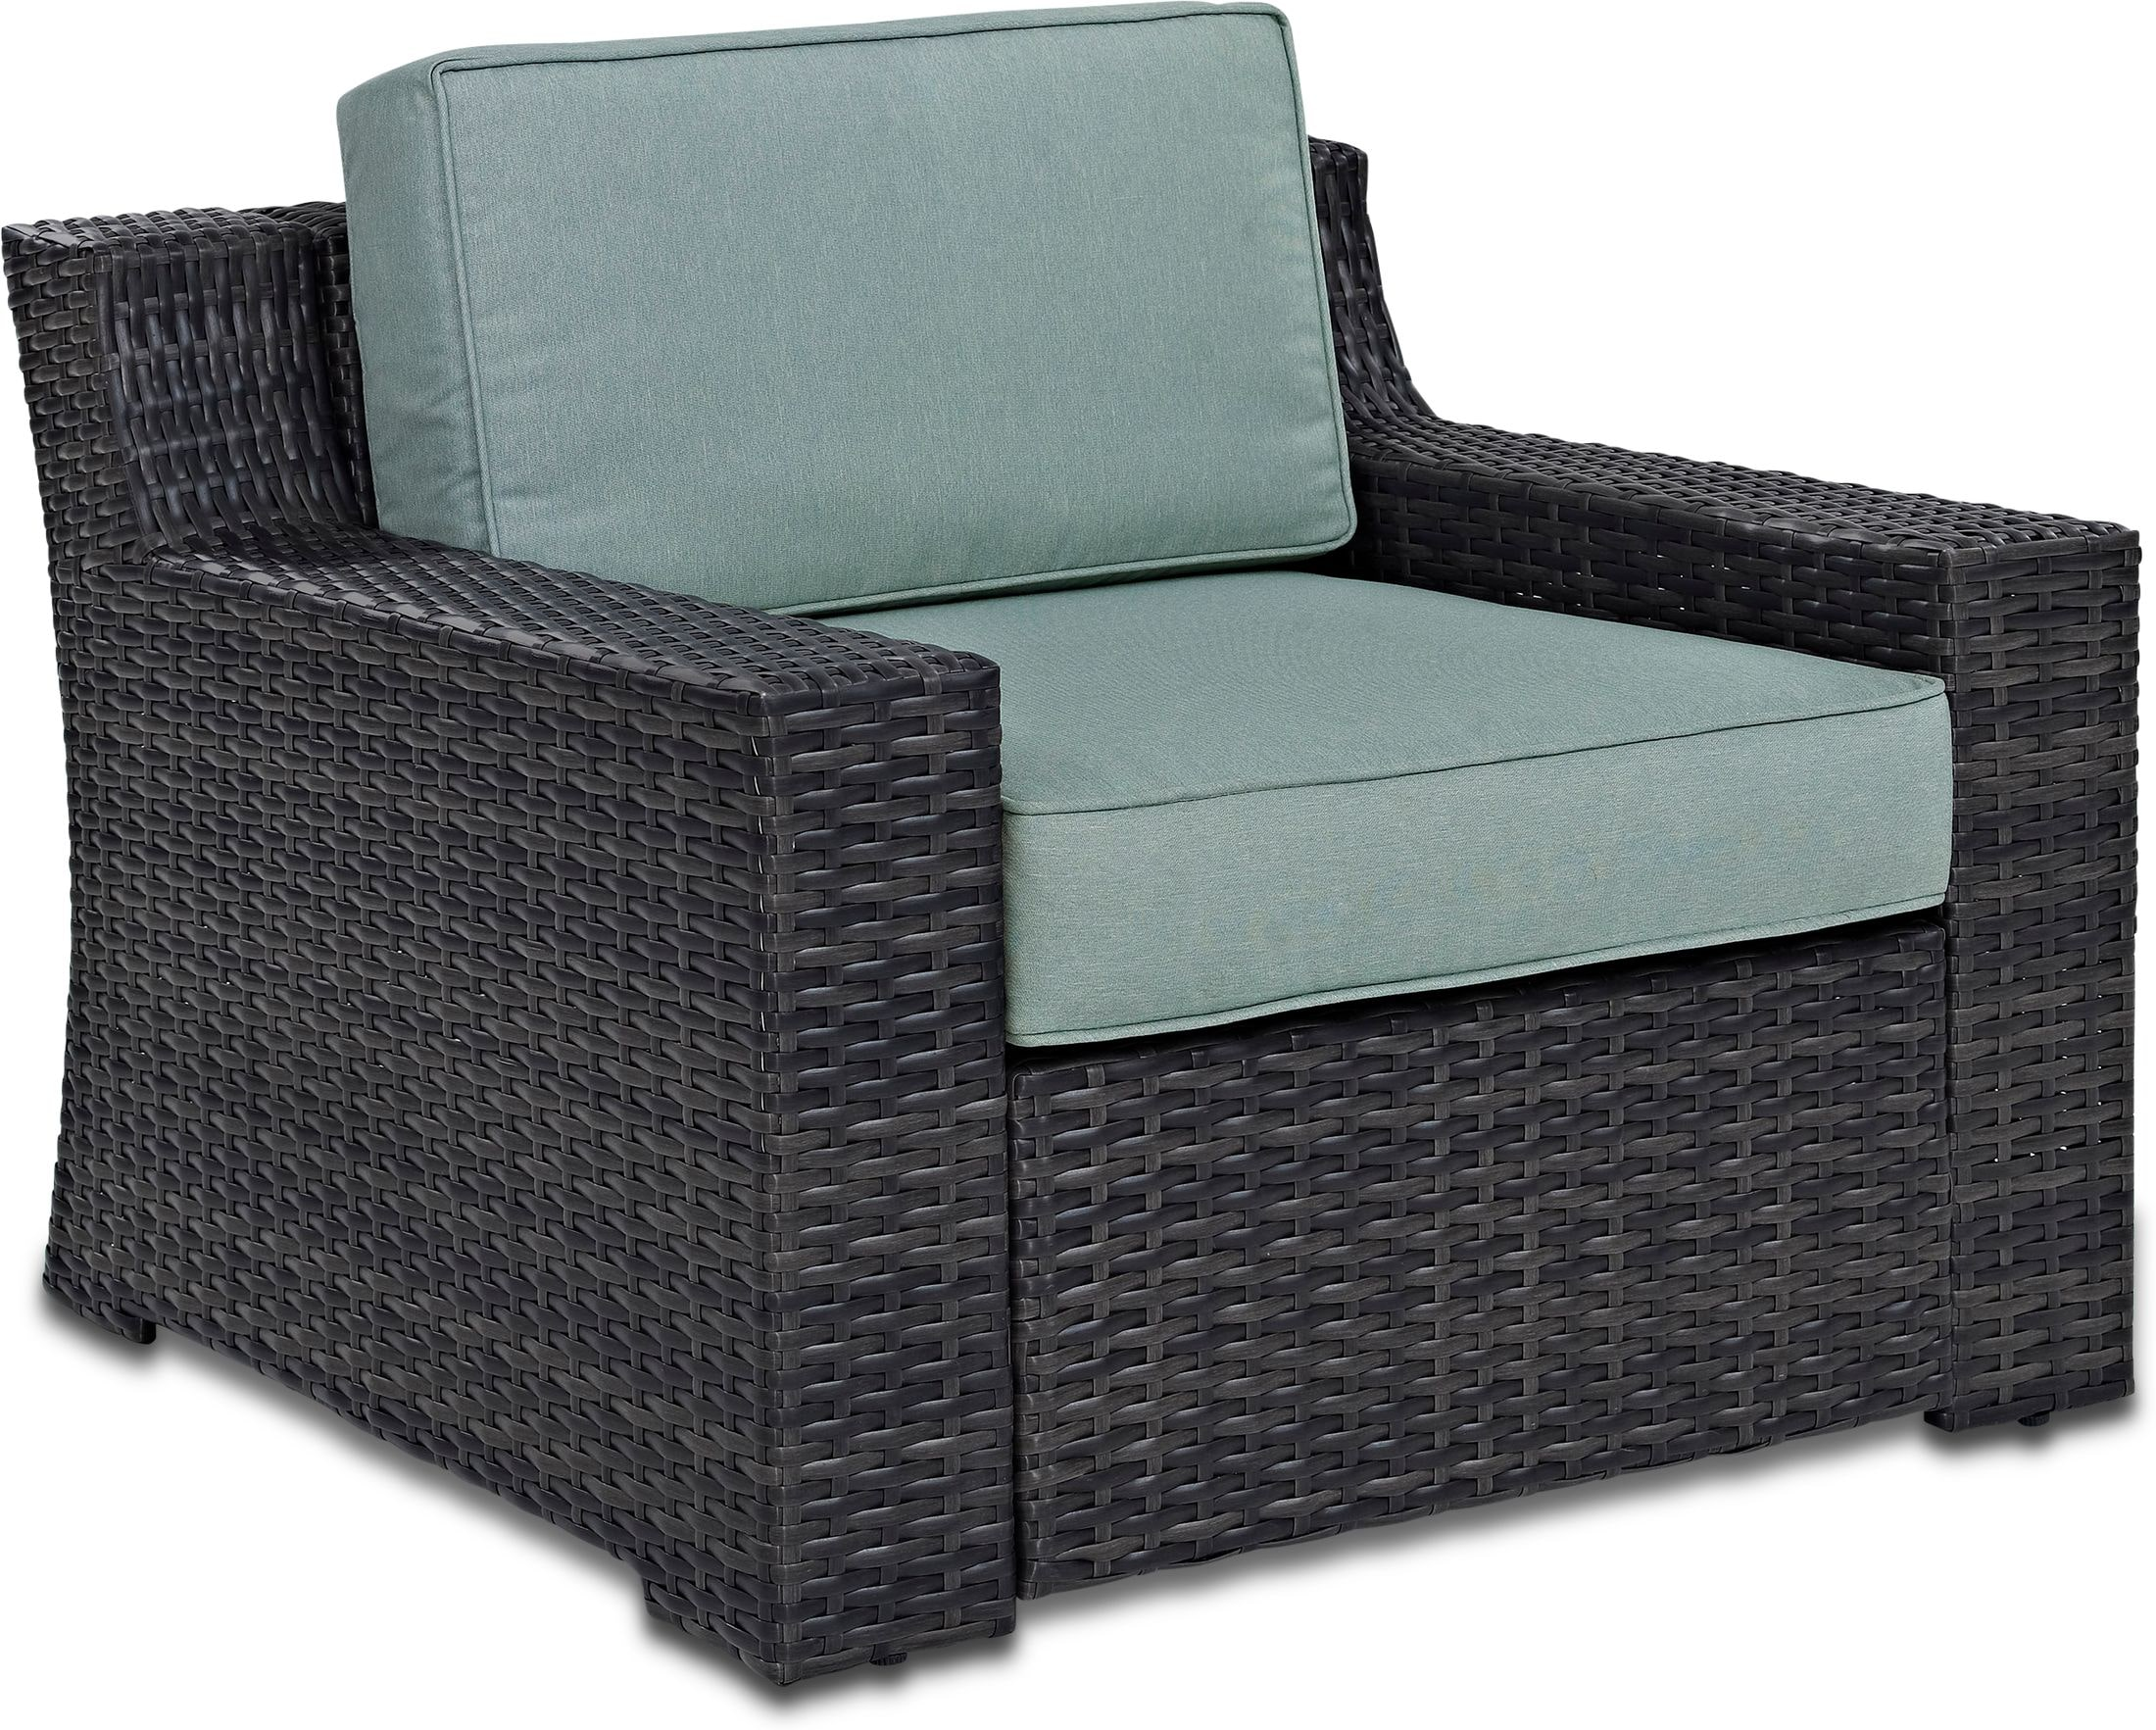 Outdoor Furniture - Tethys Outdoor Chair